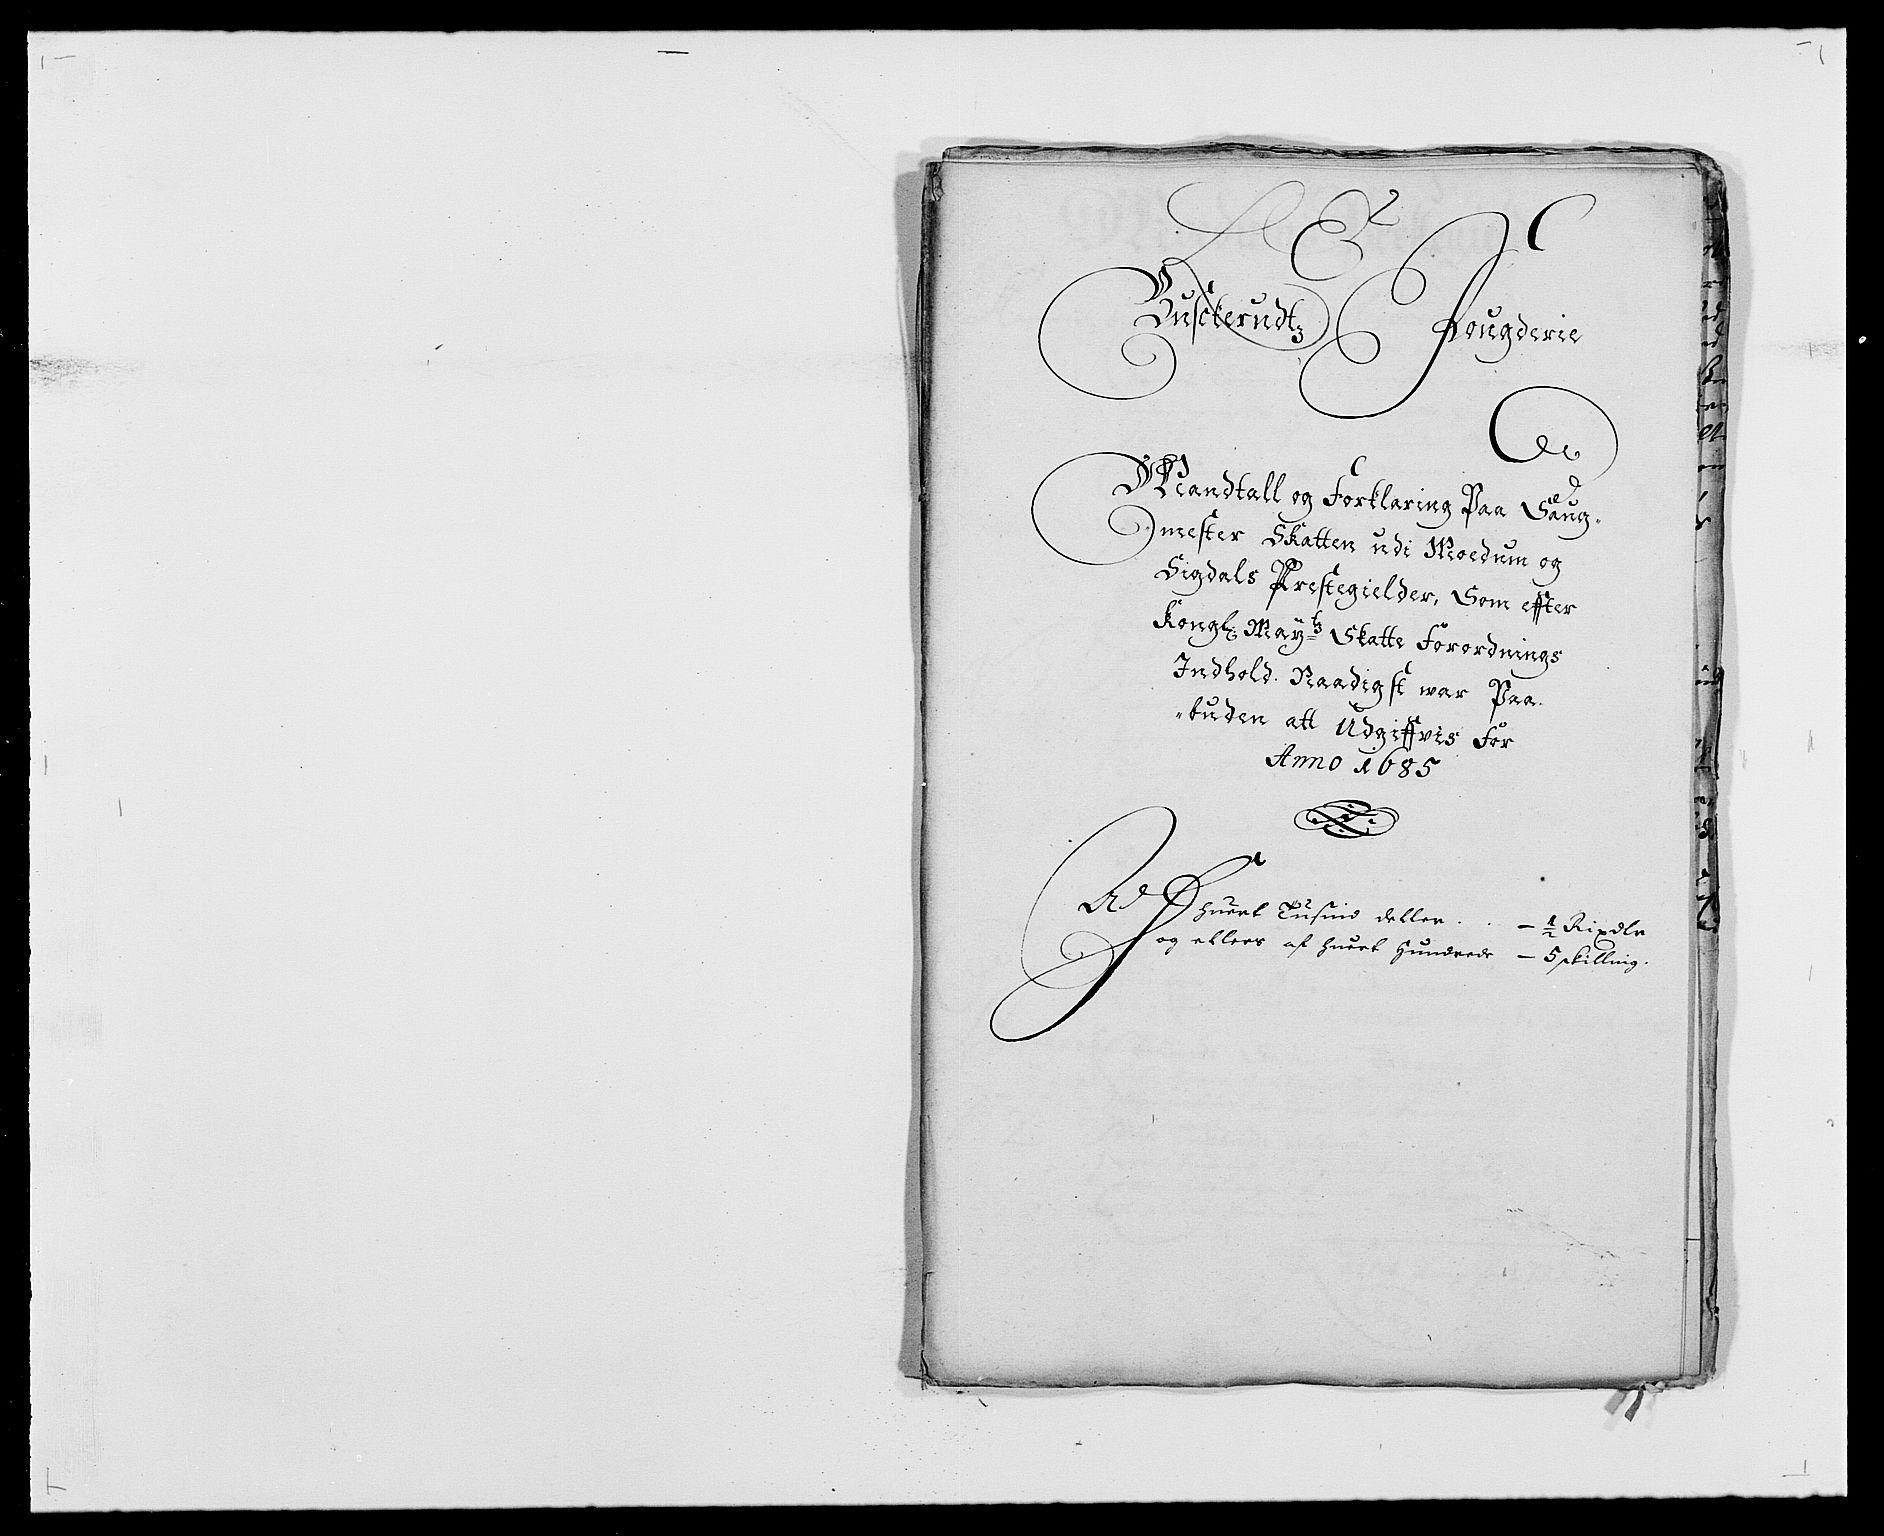 RA, Rentekammeret inntil 1814, Reviderte regnskaper, Fogderegnskap, R25/L1678: Fogderegnskap Buskerud, 1685-1686, s. 99